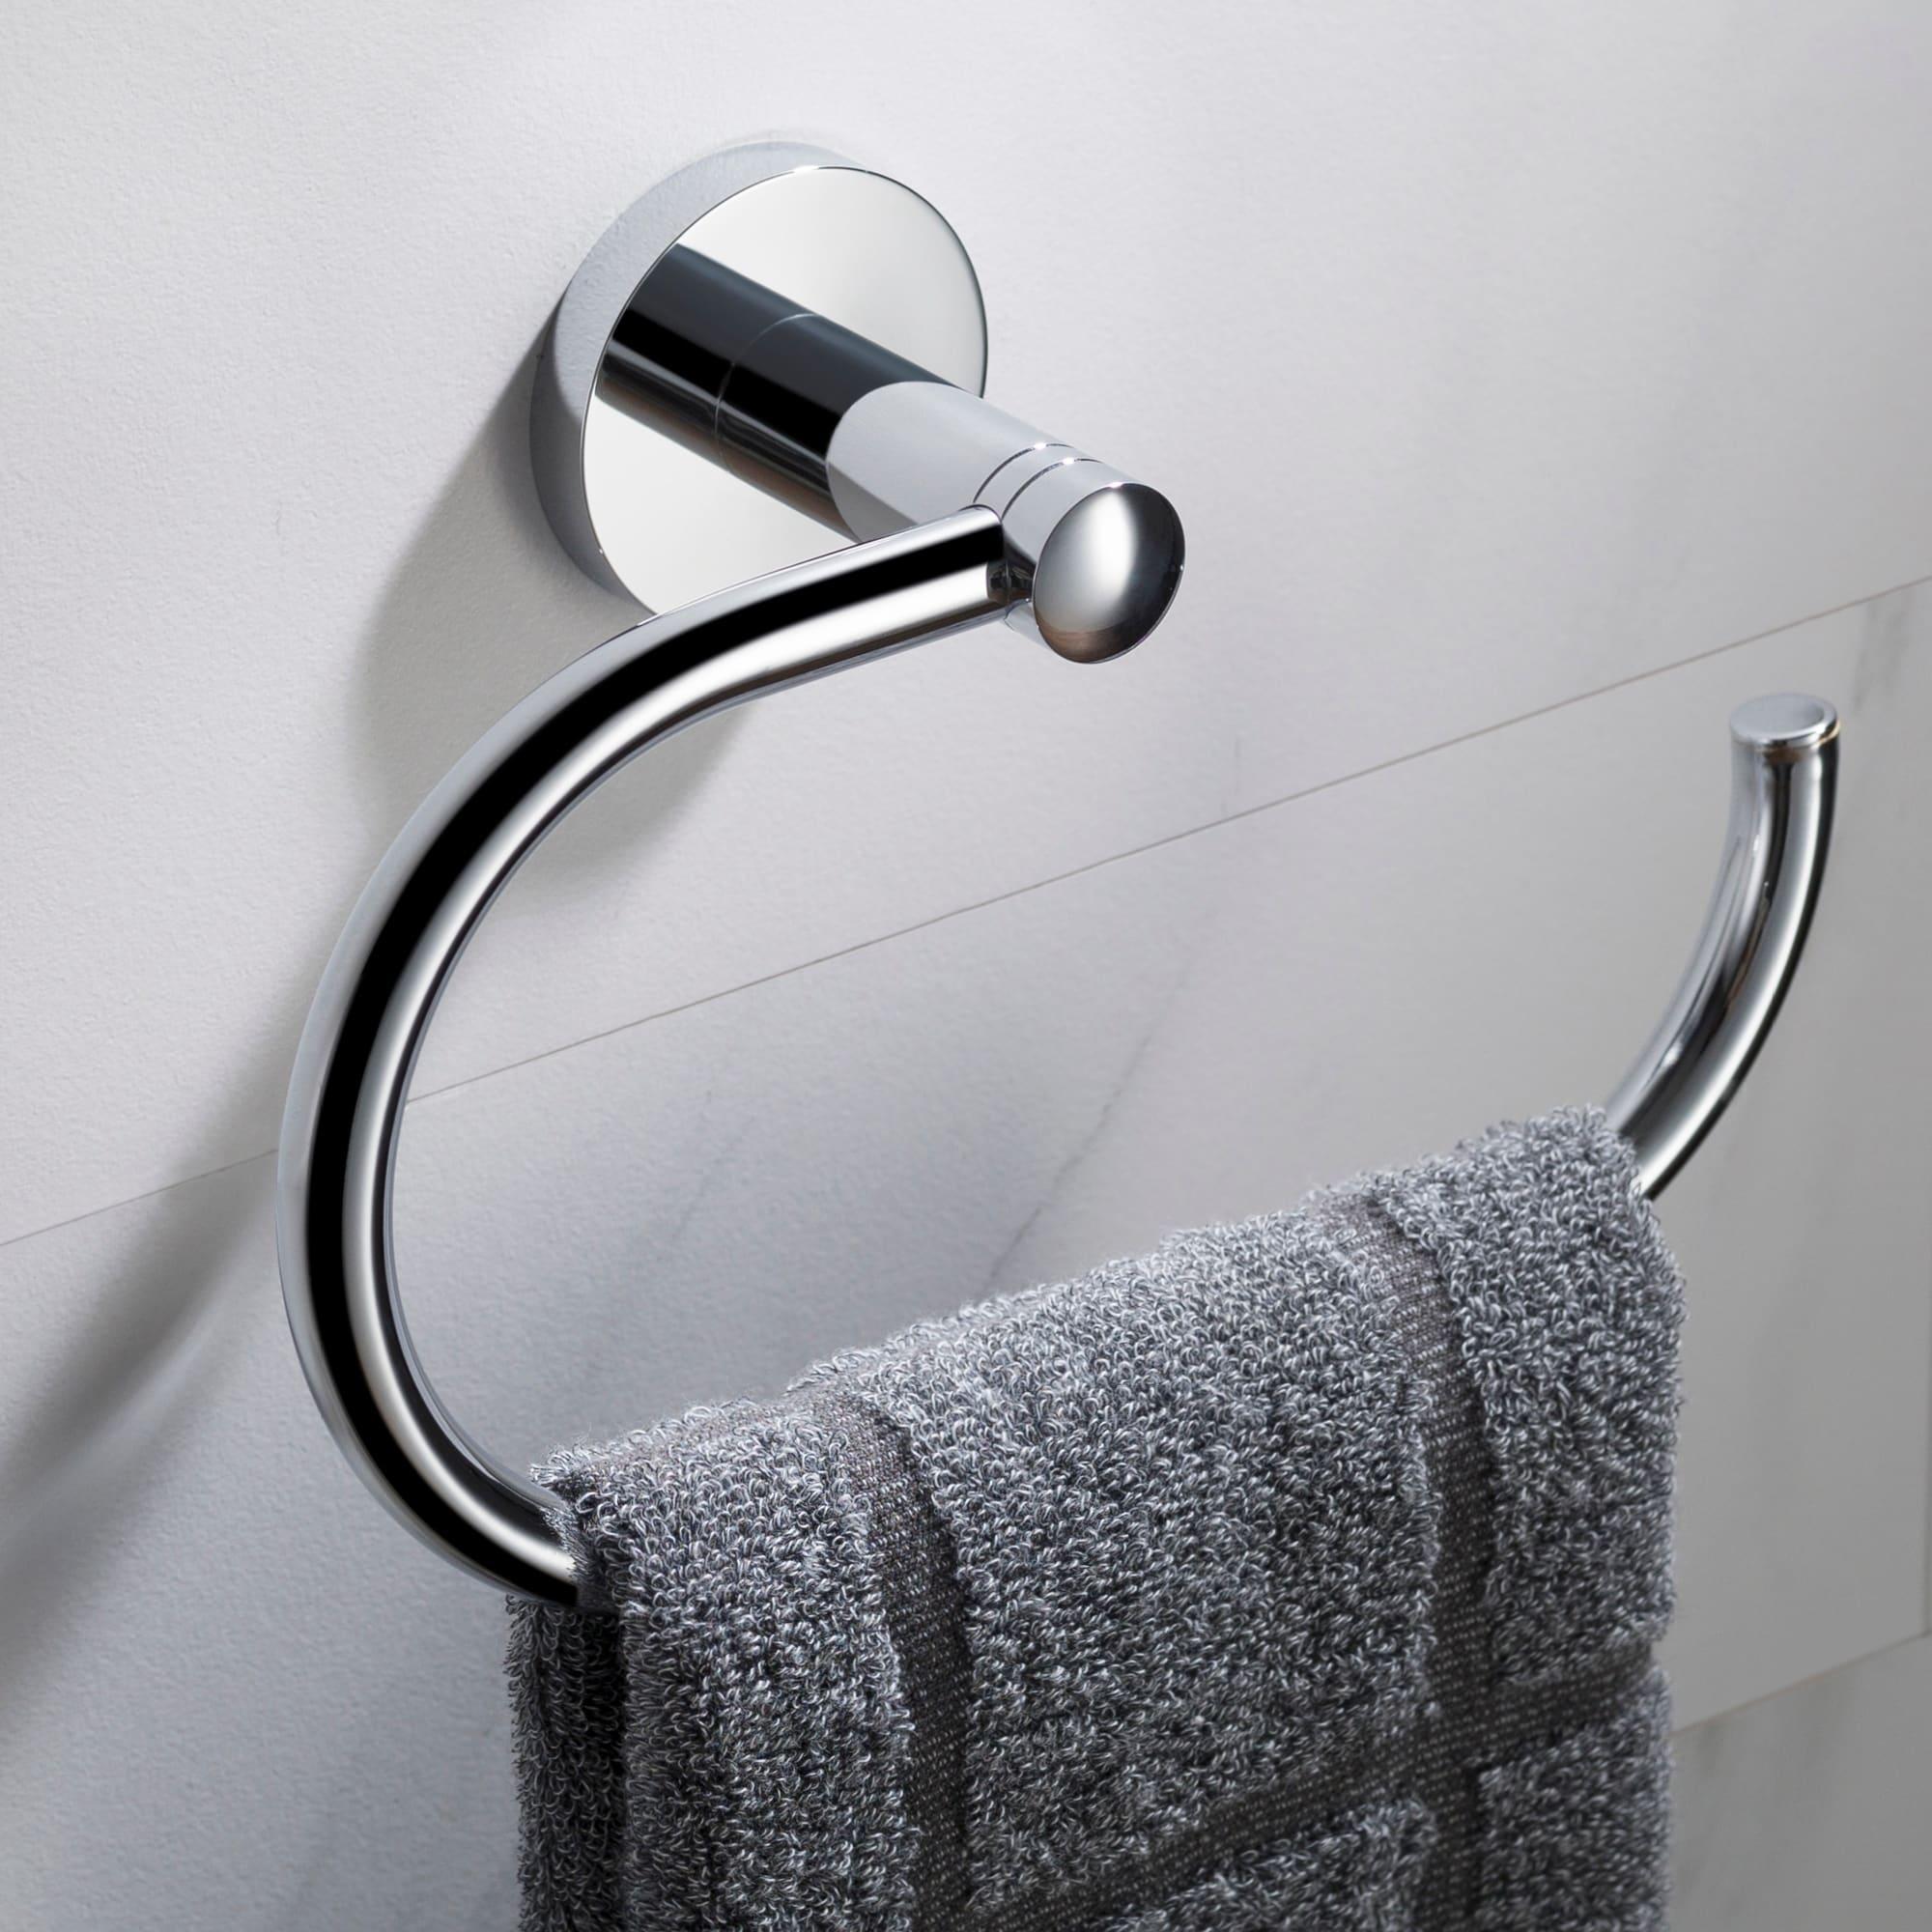 KRAUS Elie KEA-18825 Bathroom Towel Ring in Chrome, Brushed Nickel, Matte Black Finish